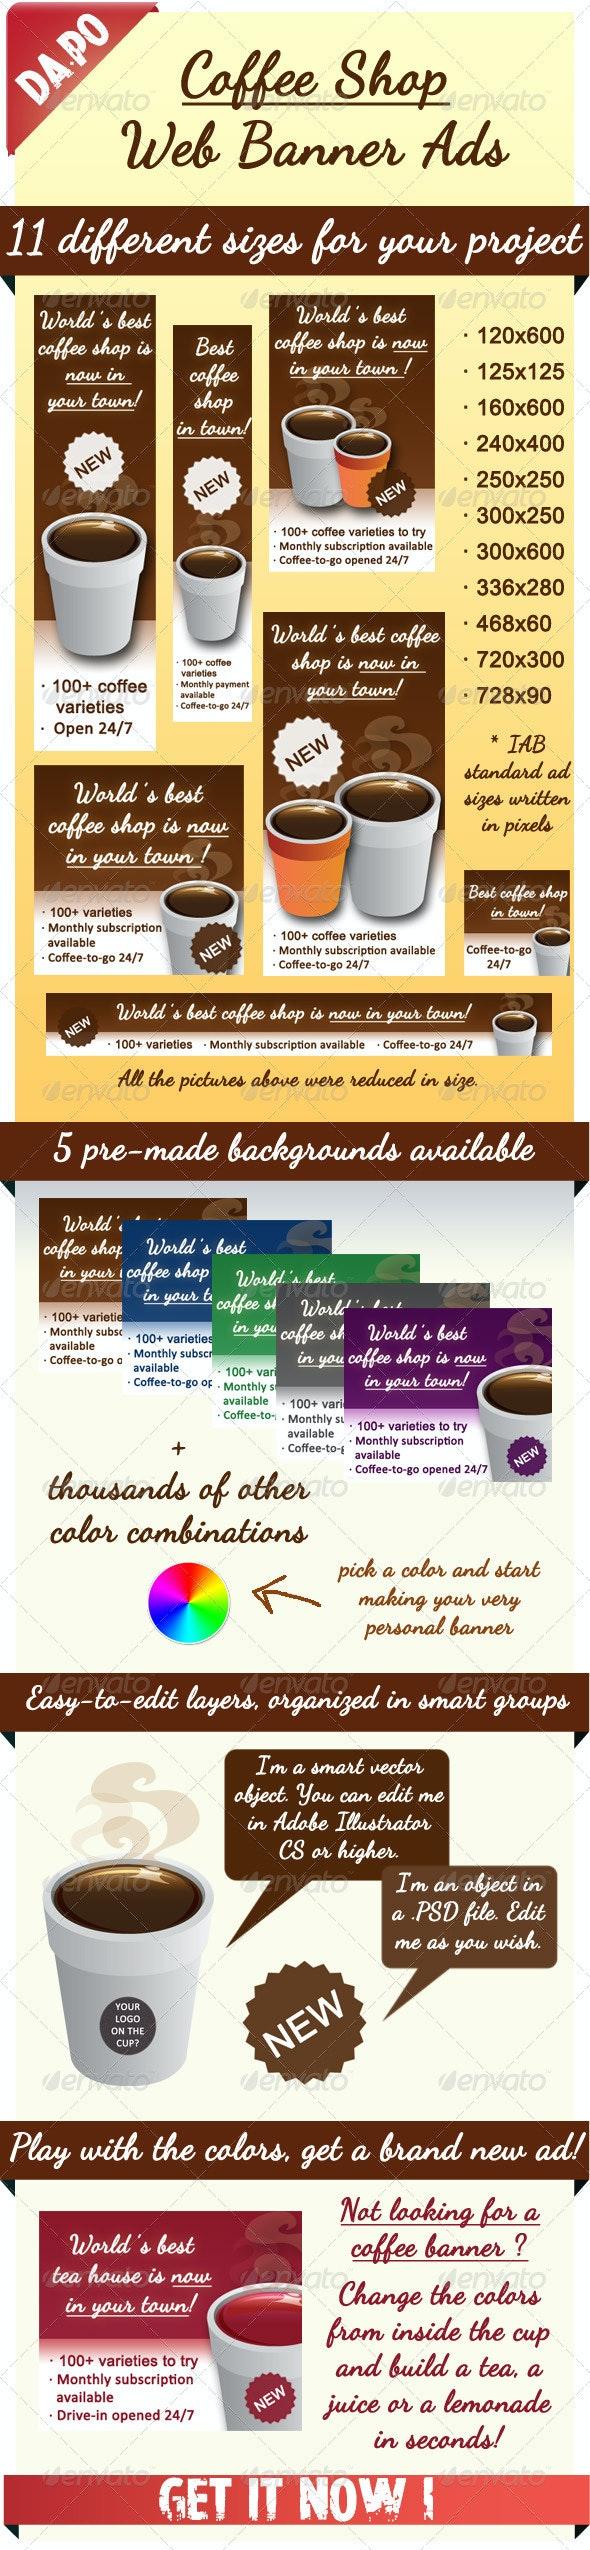 Coffee Shop Web Banner Ads